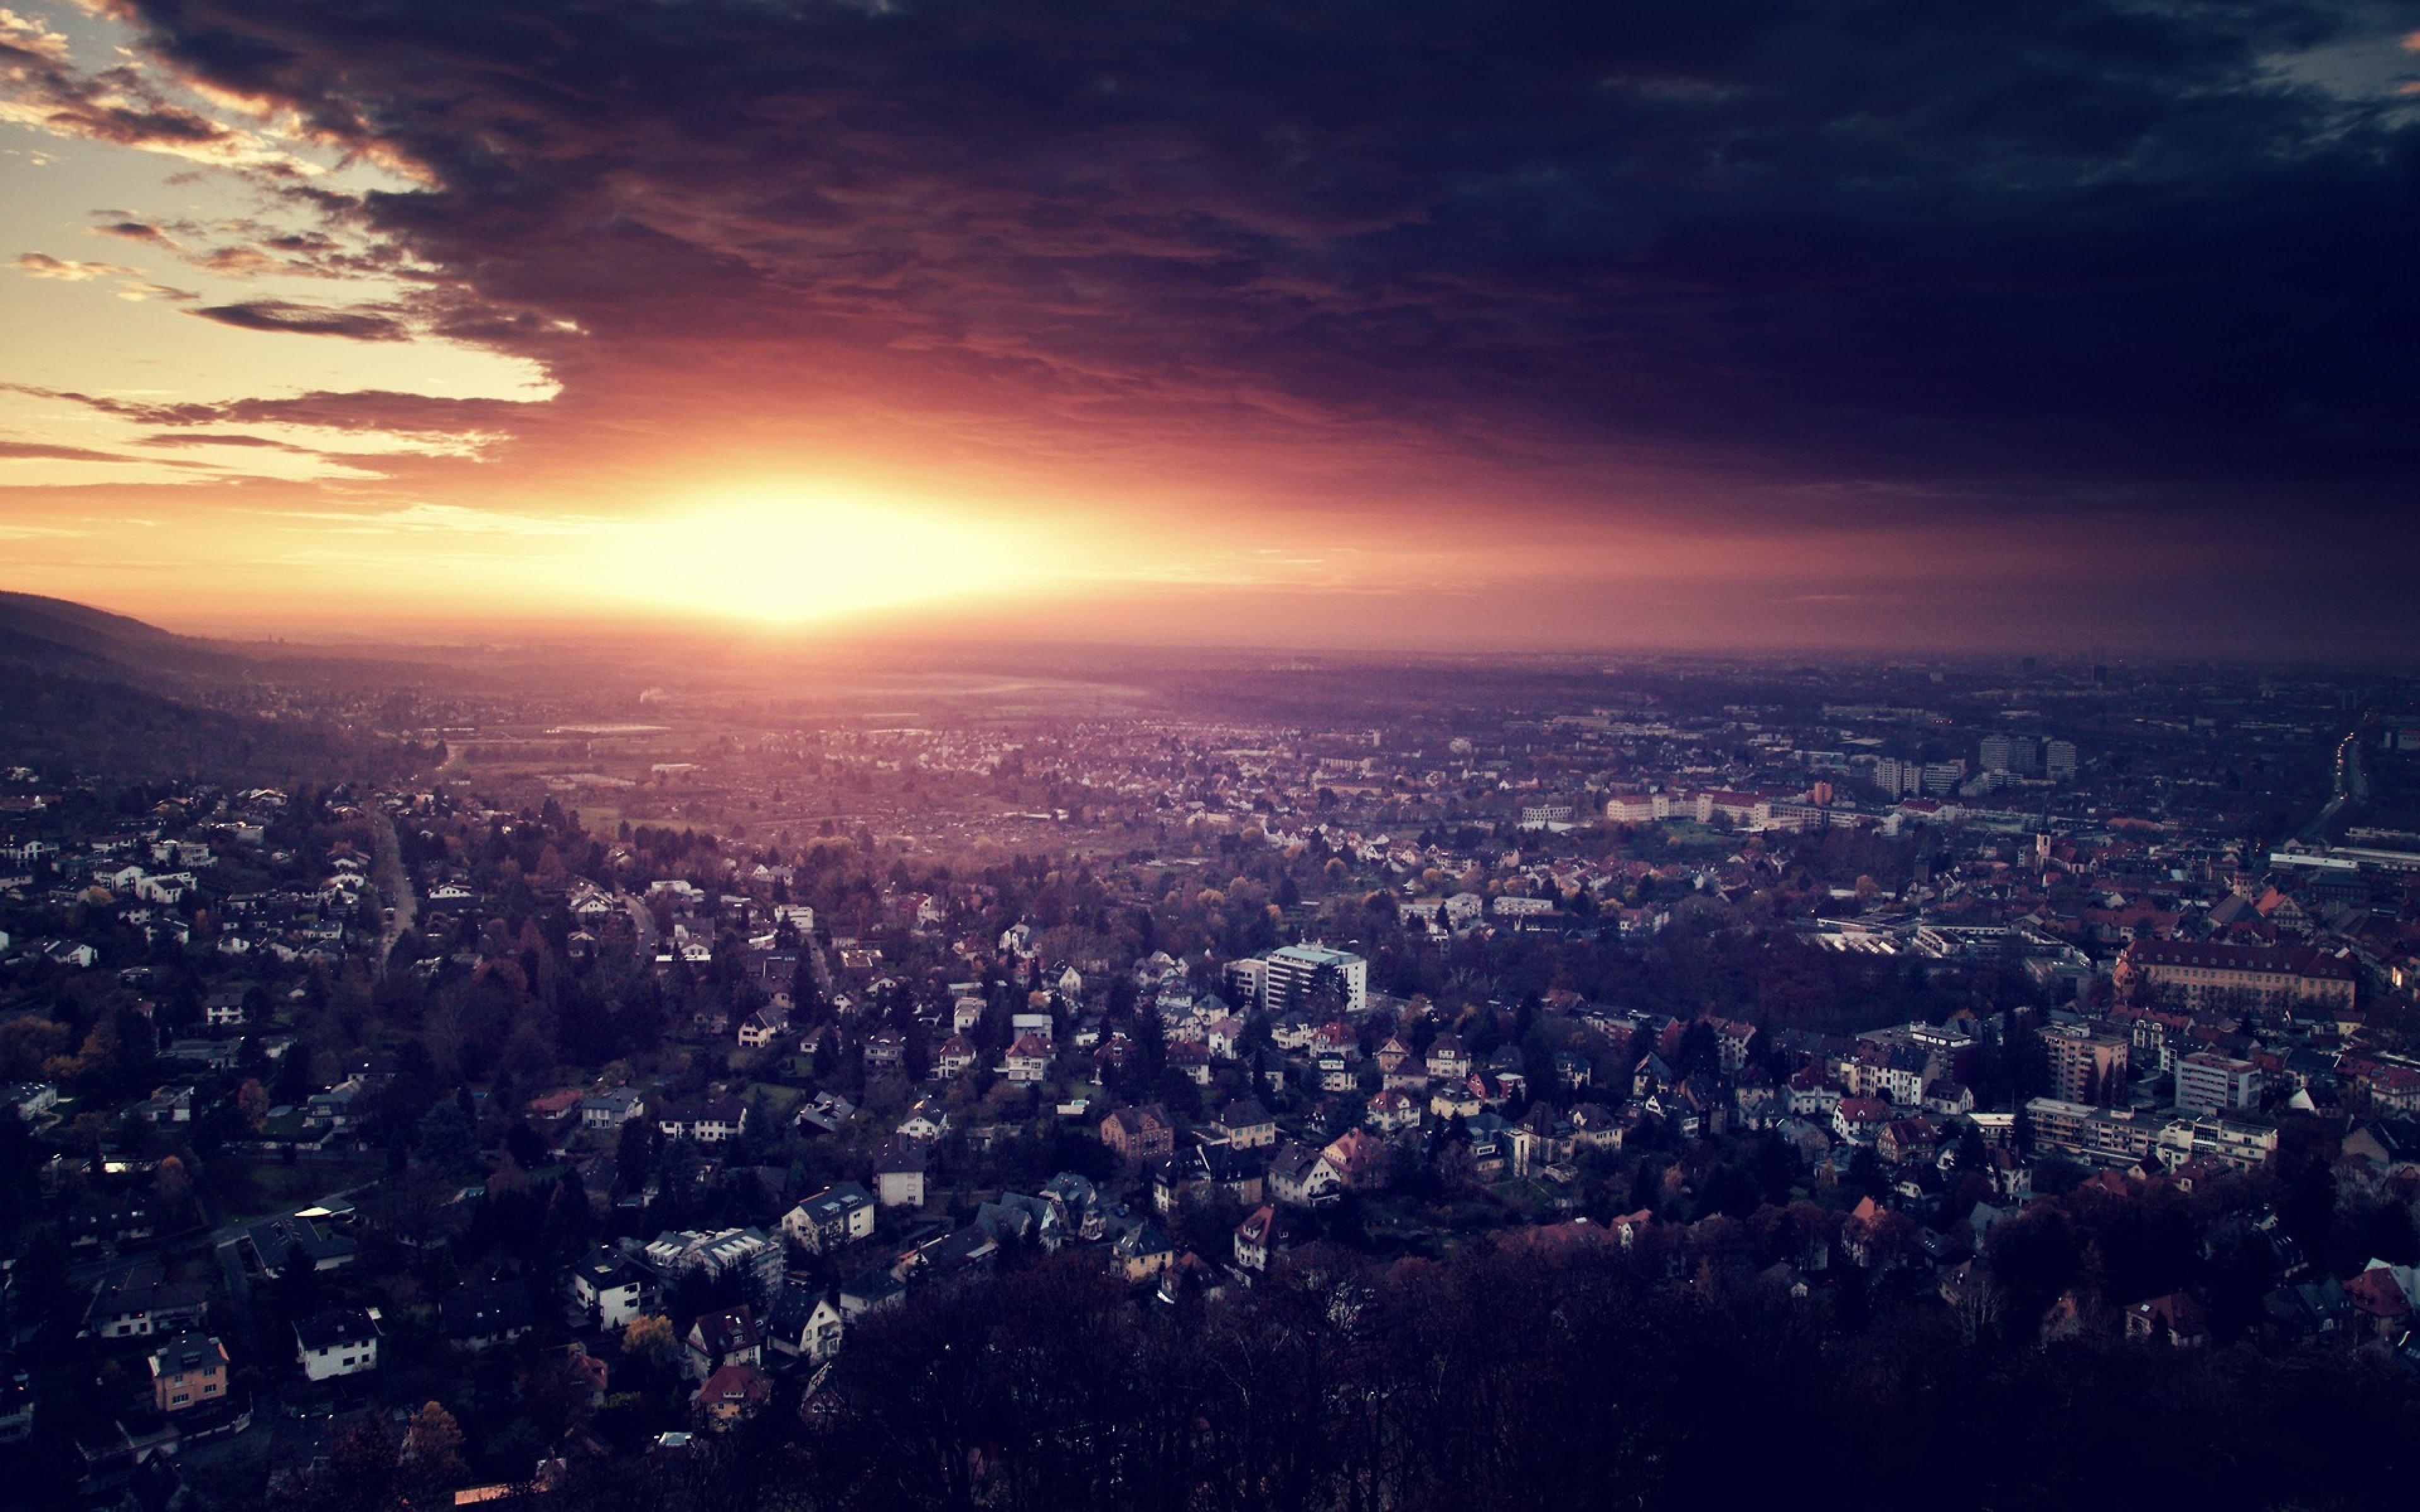 city night sky hd - photo #6